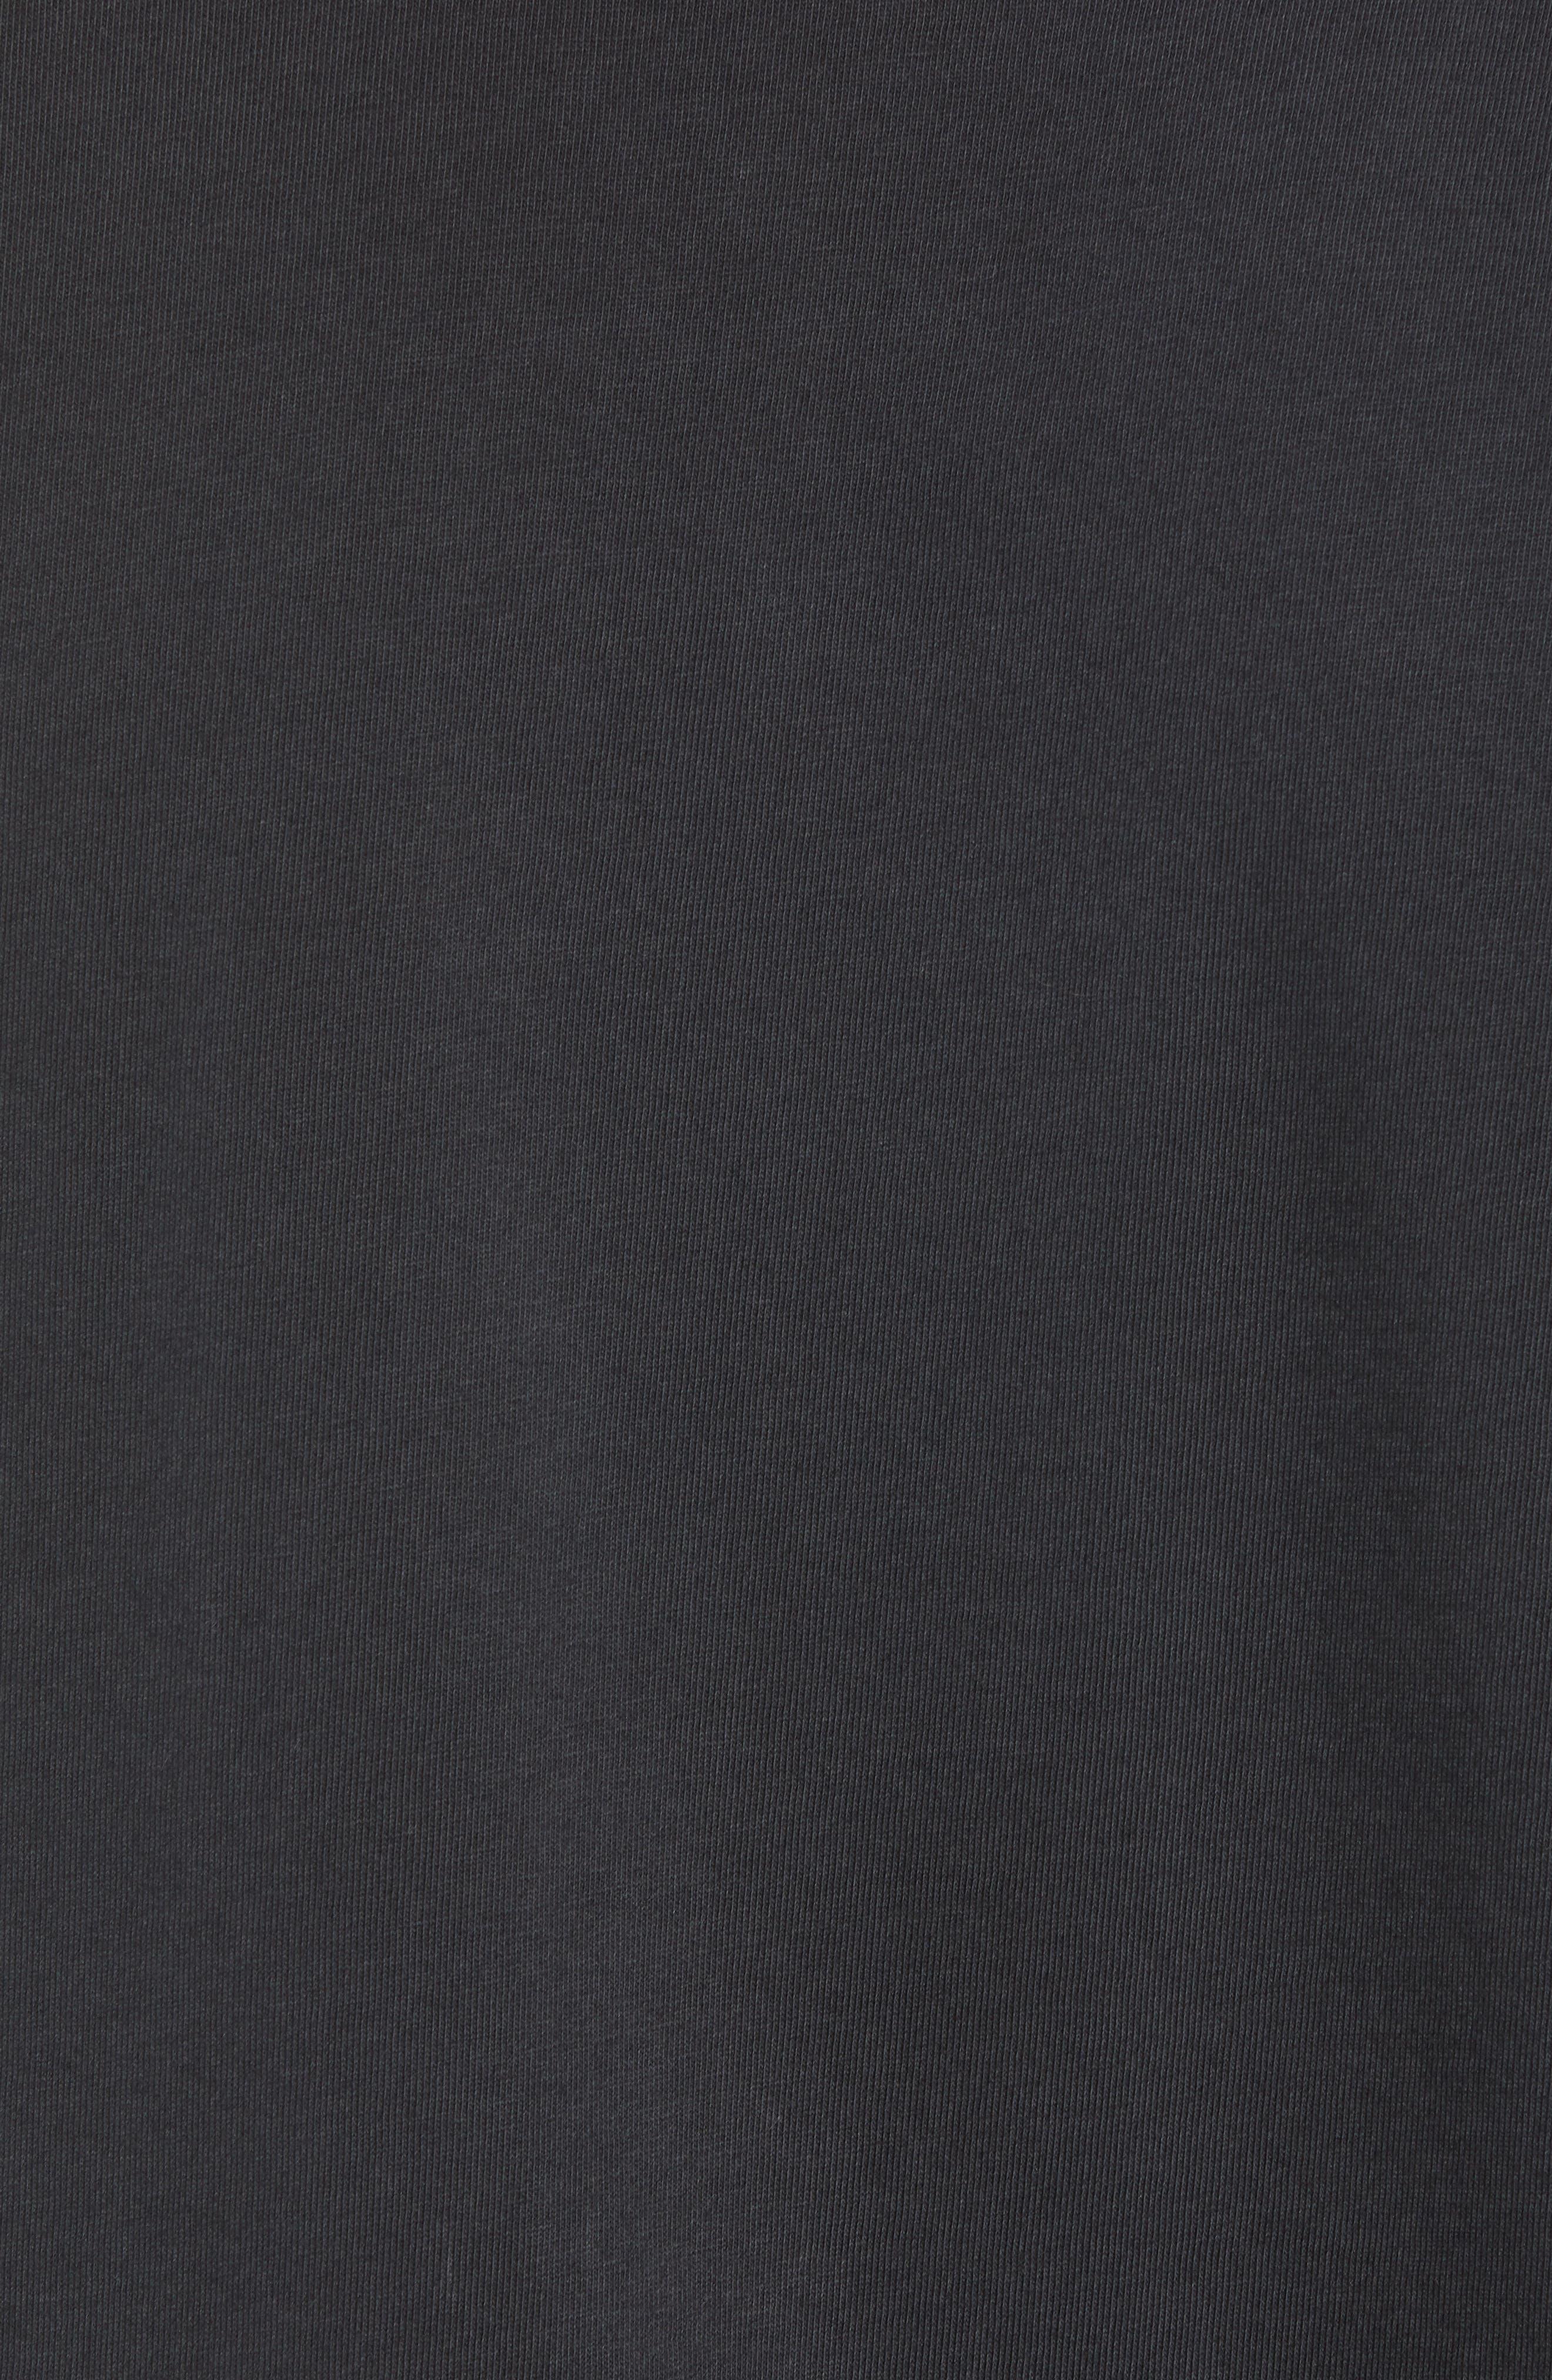 Regular Fit Elongated T-Shirt,                             Alternate thumbnail 5, color,                             BLACK